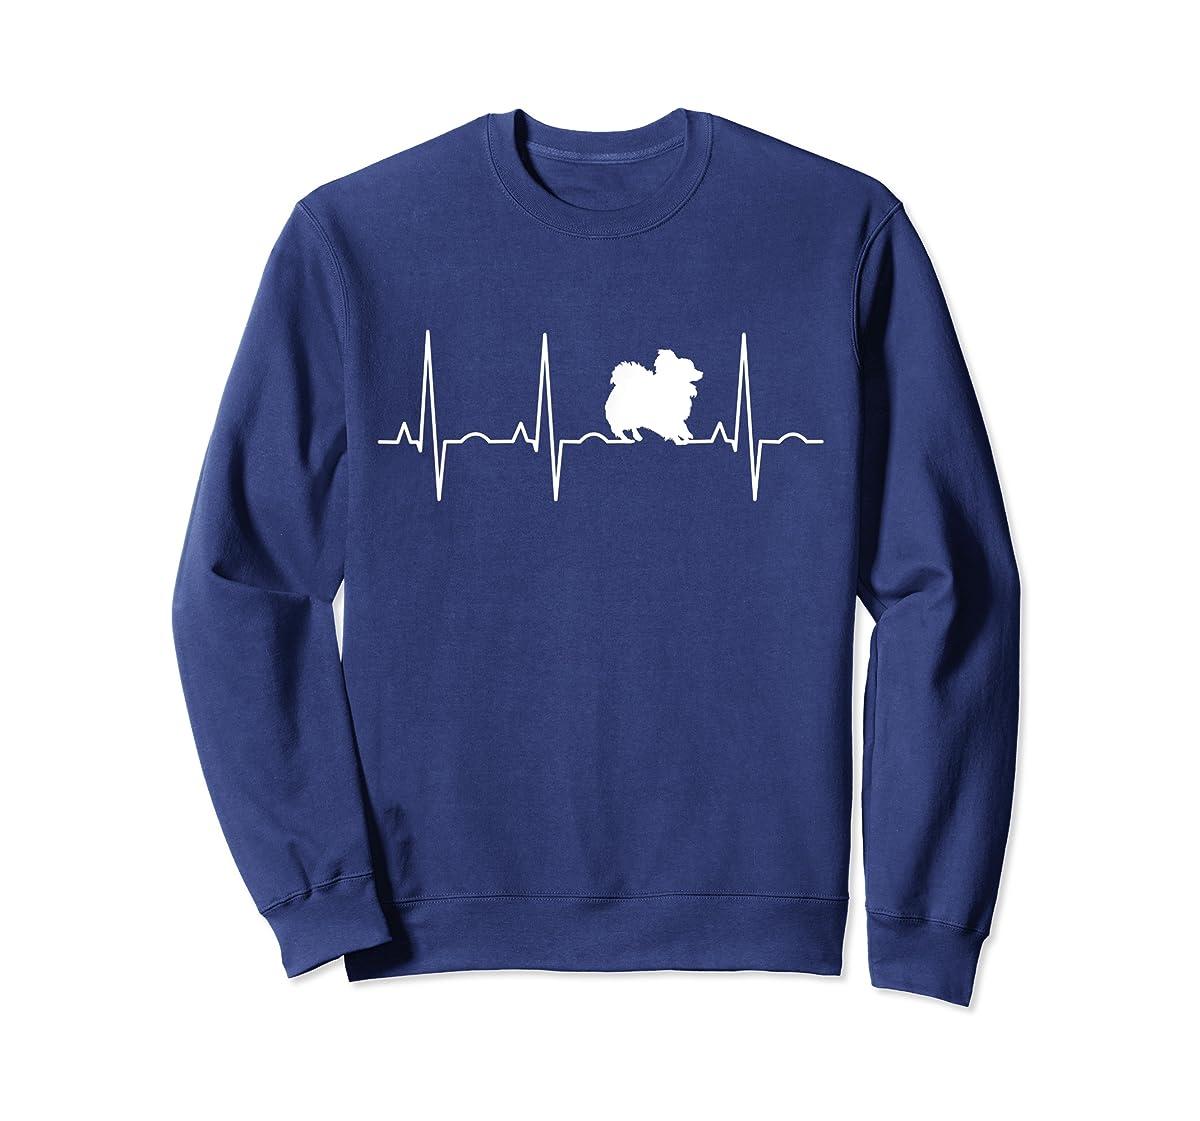 Pomeranian Heartbeat T-Shirt Pom Shirt Gifts Dog Lover-Sweatshirt-Navy